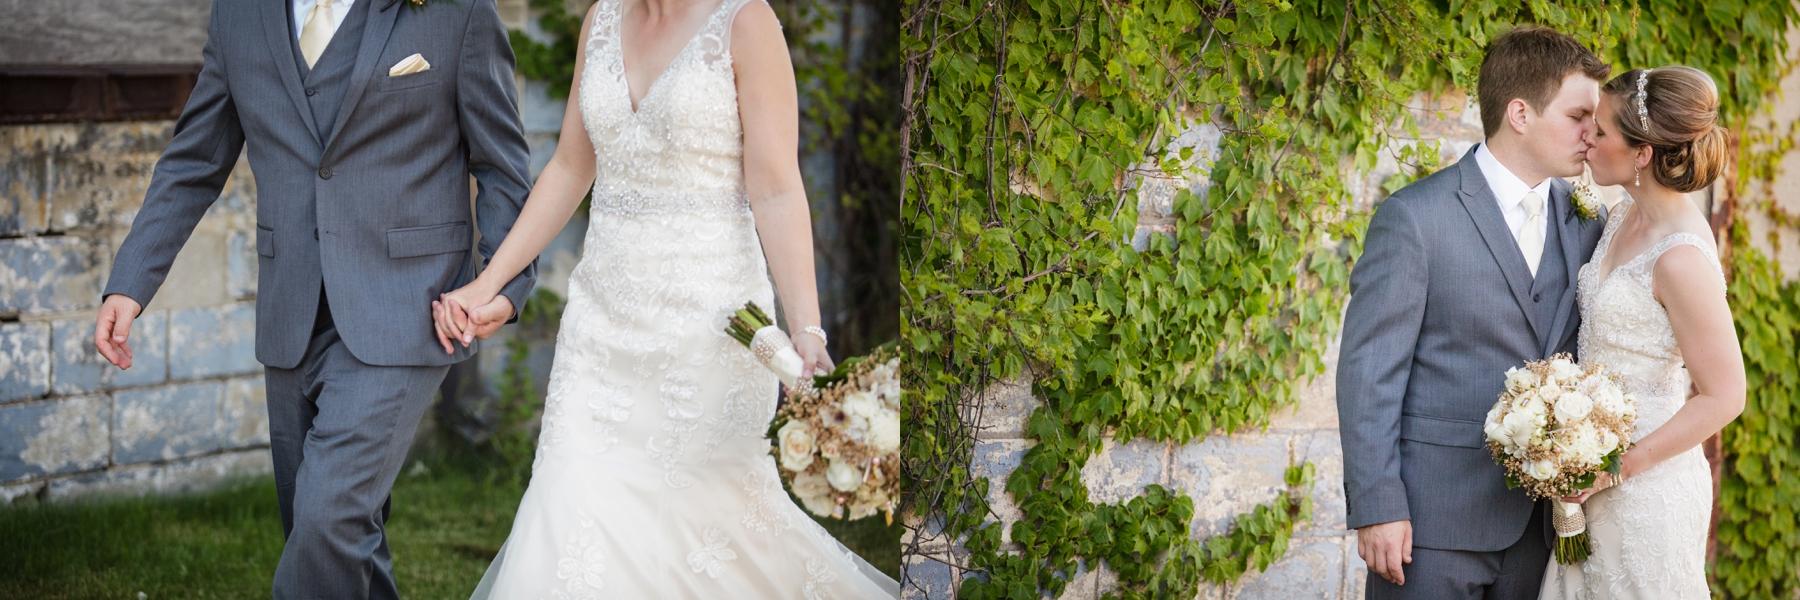 Ben_Jillian_Midland_Baycity_Wedding_0062.jpg